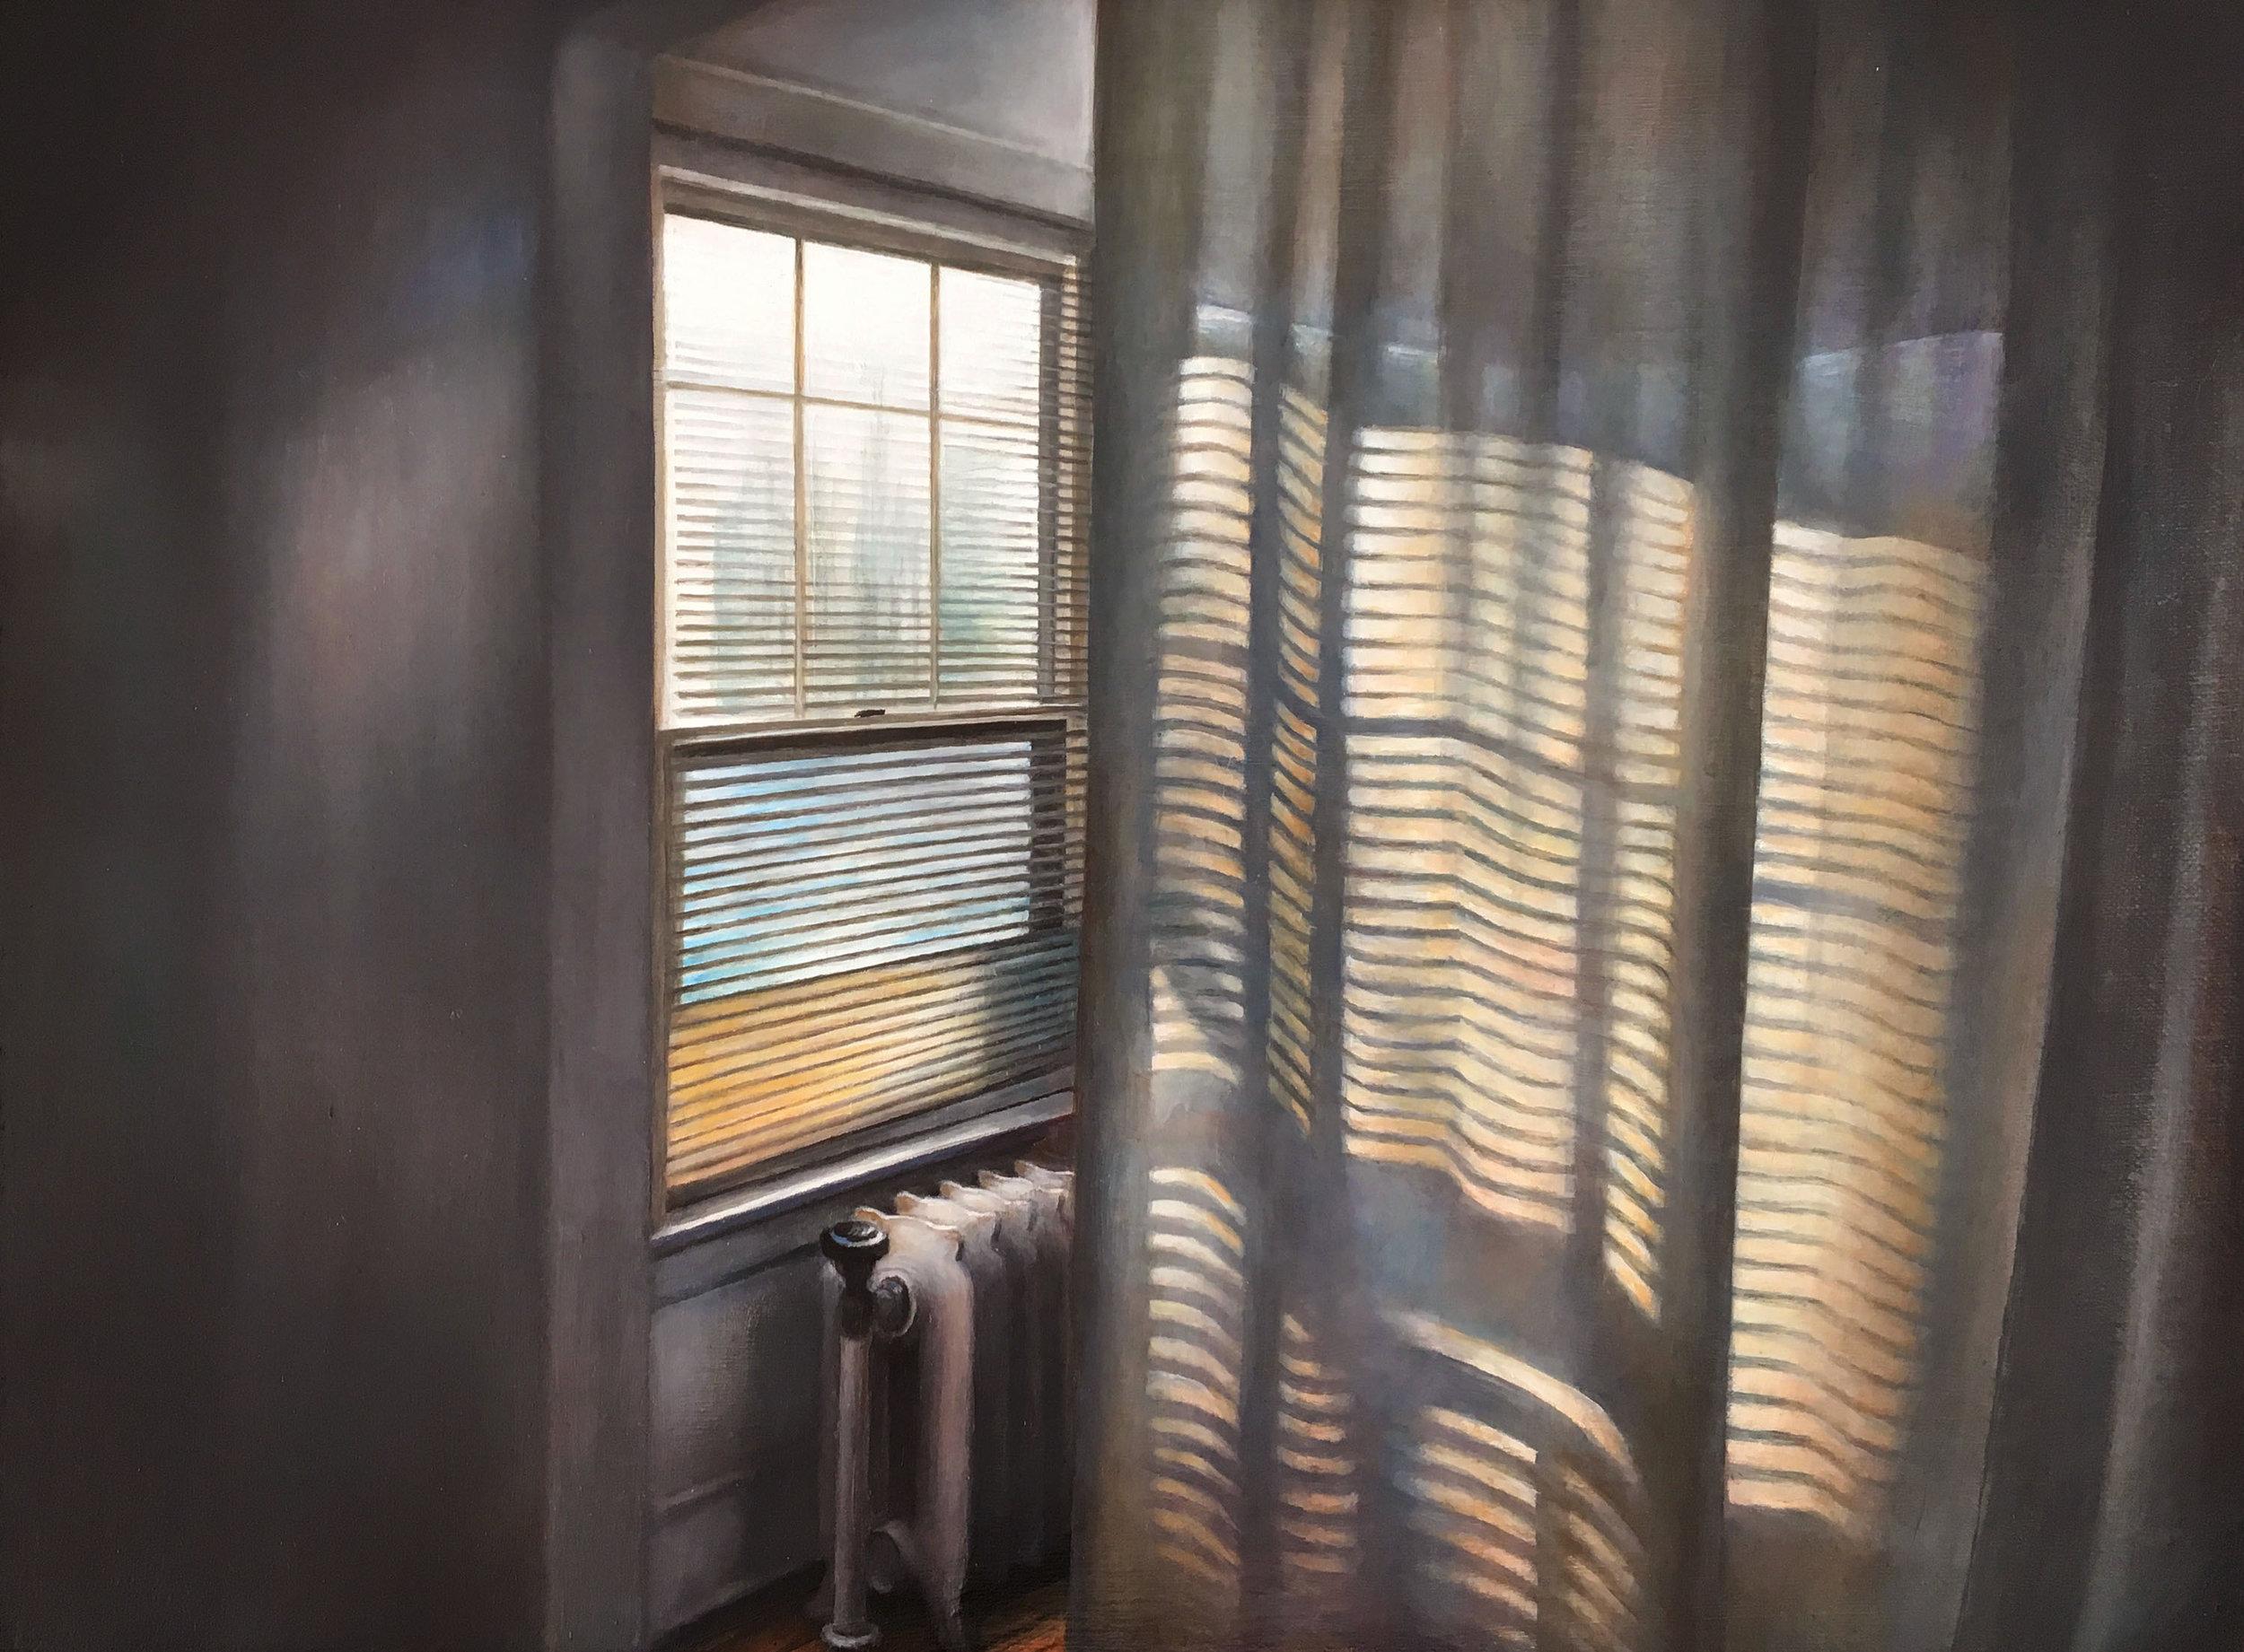 Sunroom Curtain   2017  Oil on linen  12 x 16 inches